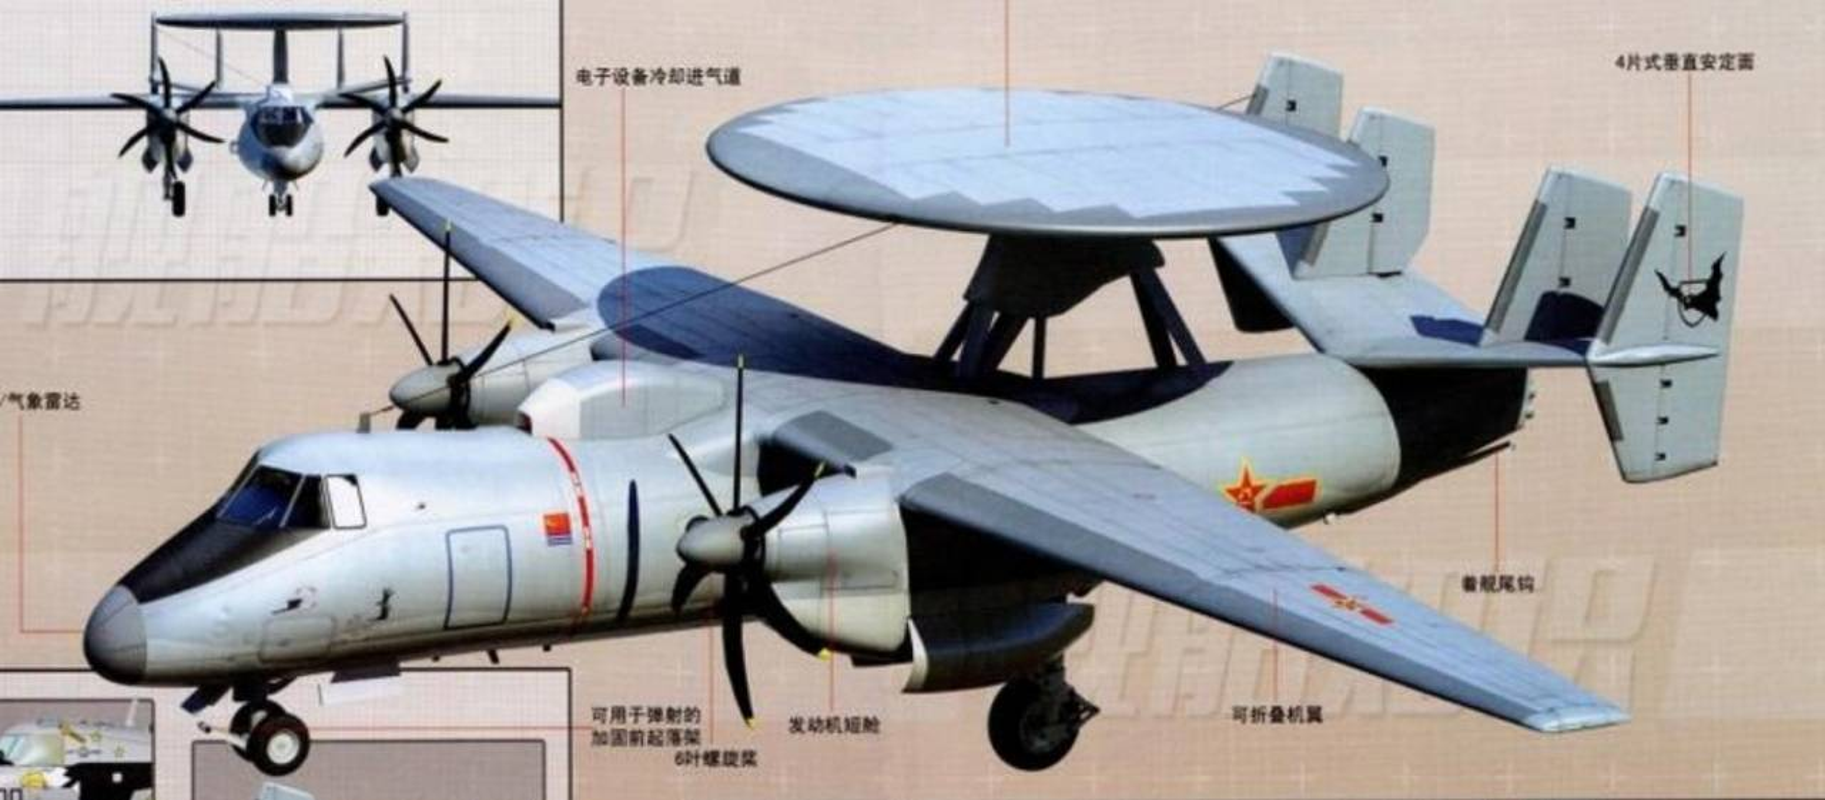 Thuc hu radar Trung Quoc co the theo doi may bay F-35 cua My?-Hinh-8